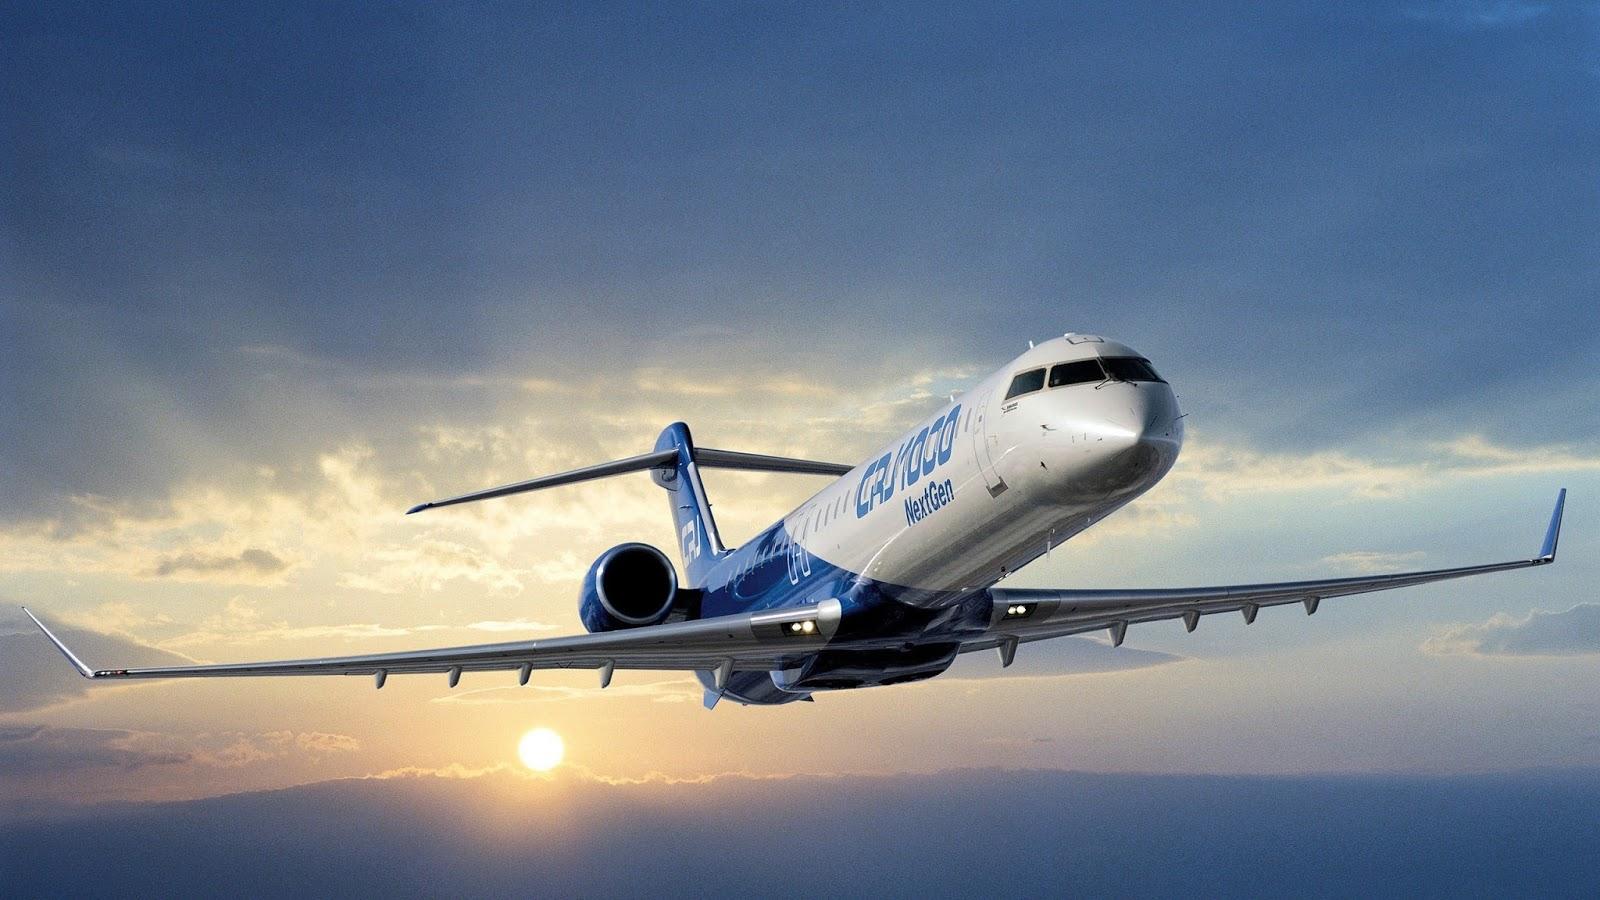 Syllabus EASA Part 66 Module 8 Basic Aerodynamics - Exam Part 66